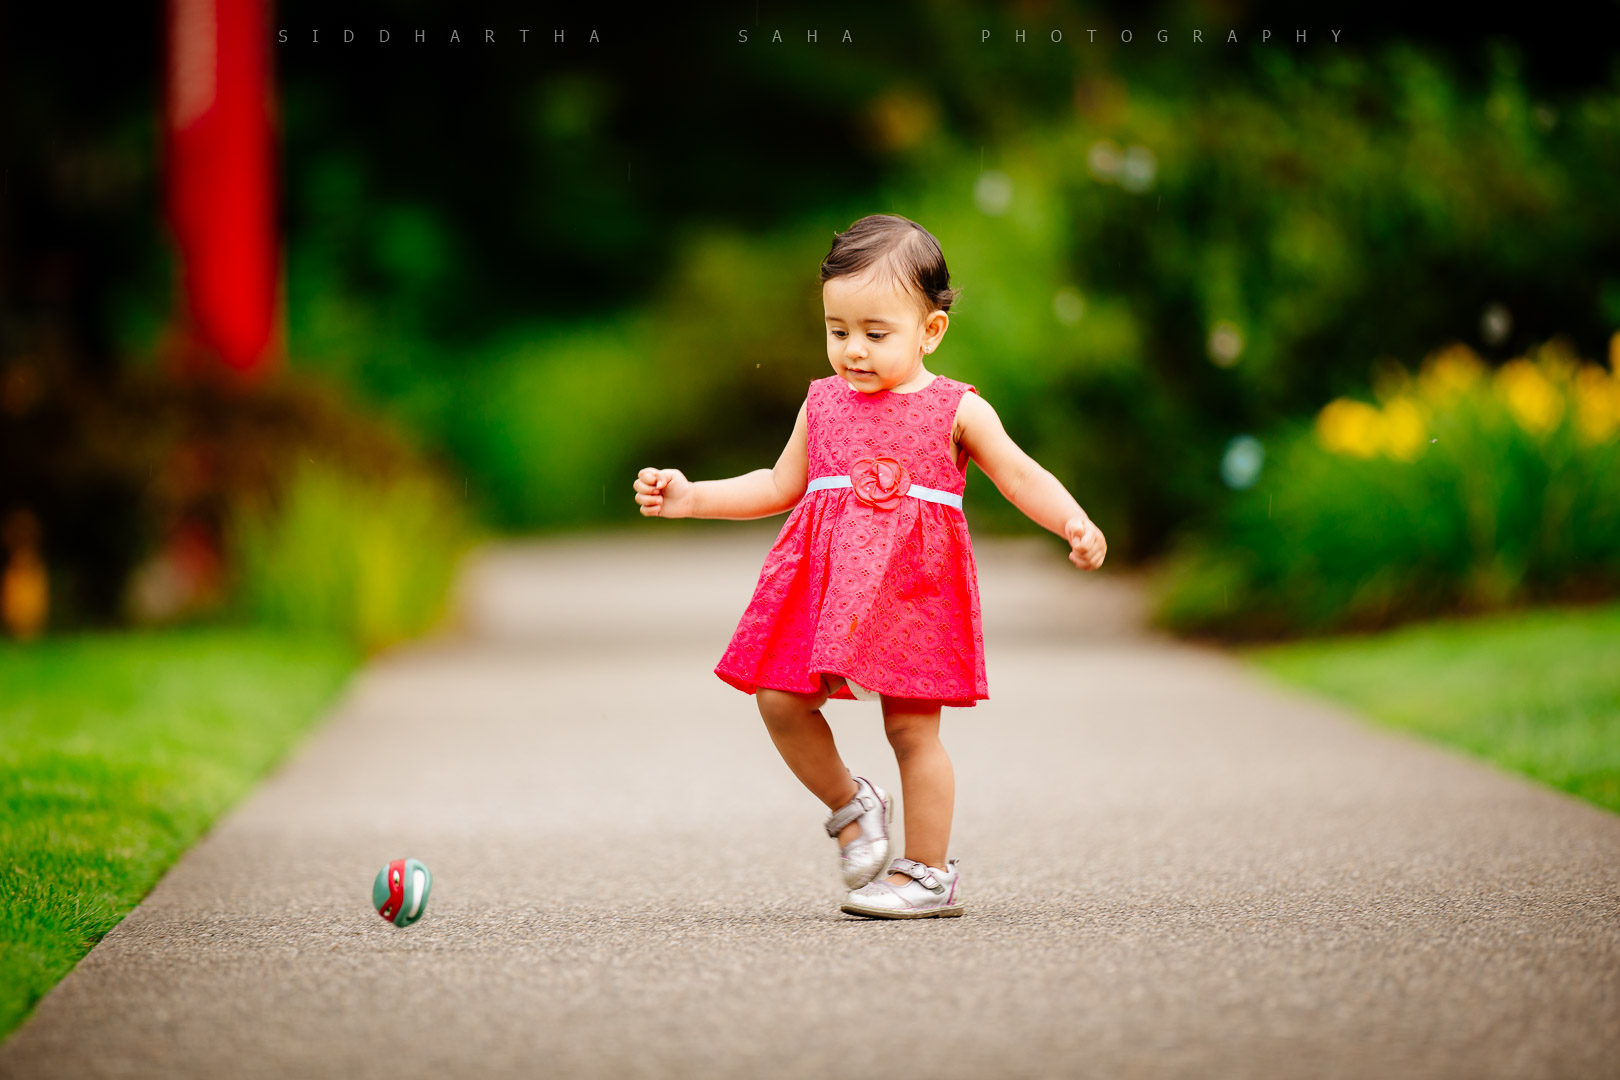 2015-08-08 - Padmaja Ketan Family Photoshoot - _05Y8764